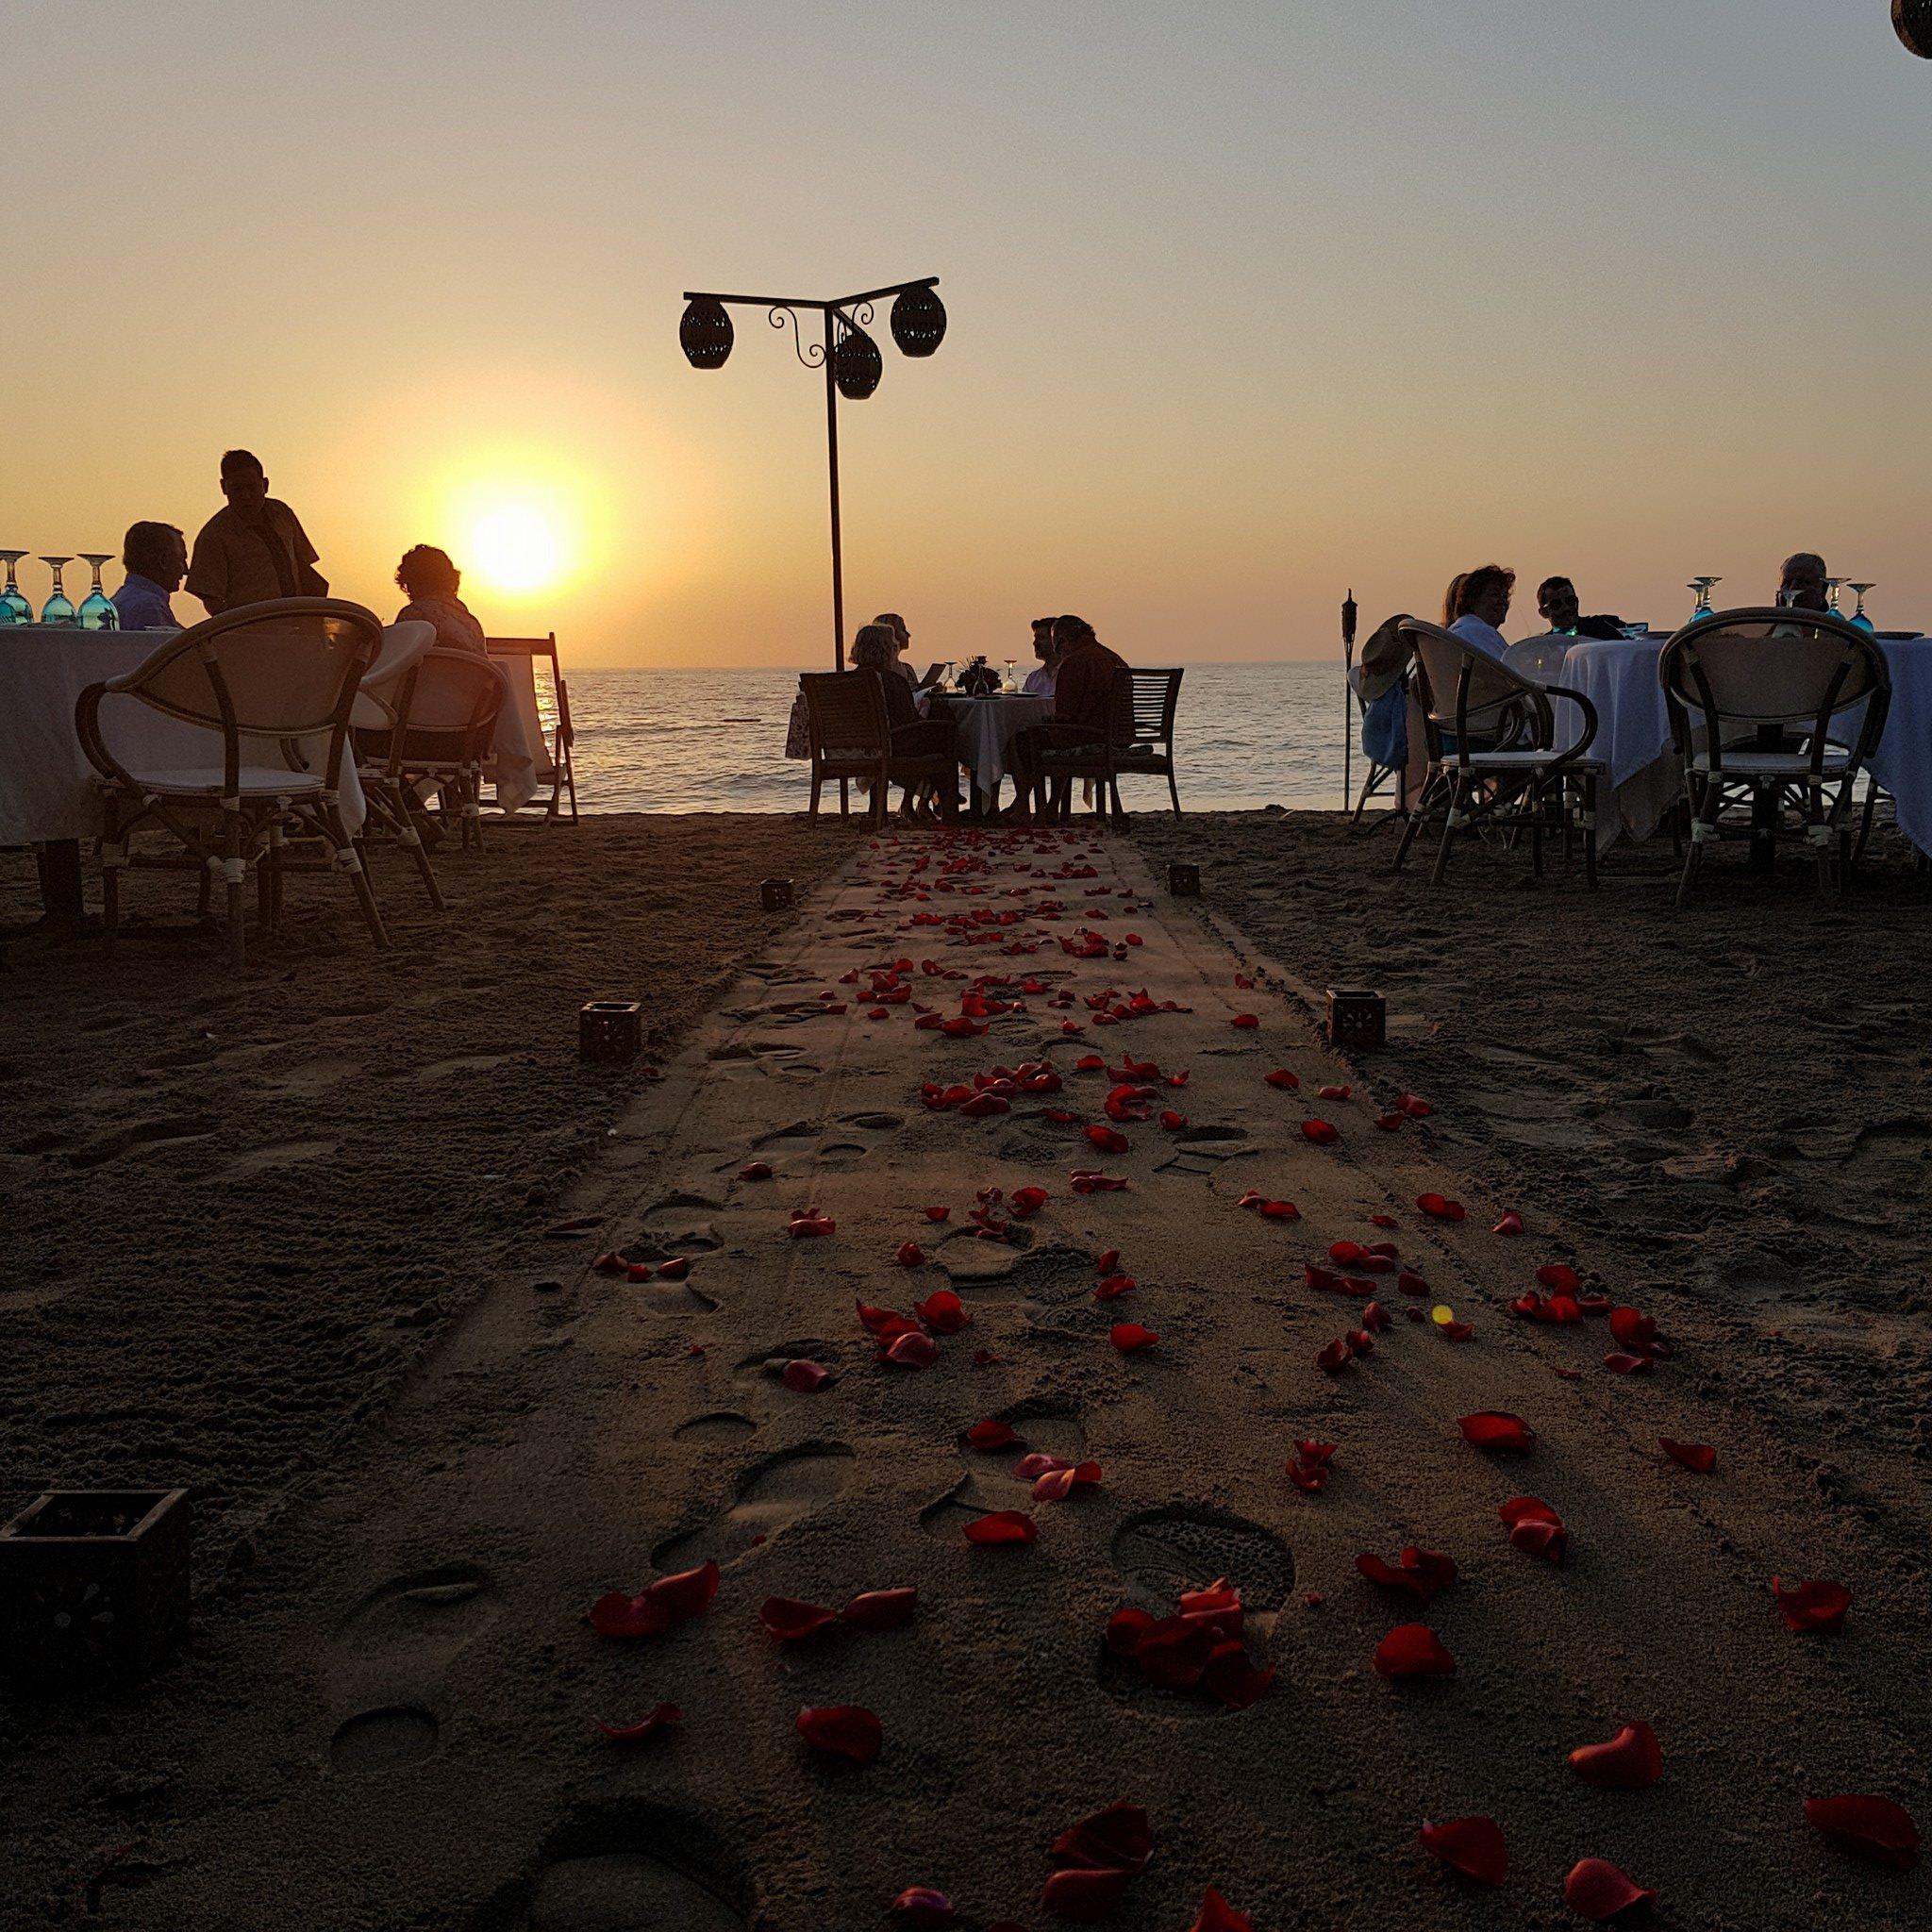 El Dorado Restaurant & Beach Club